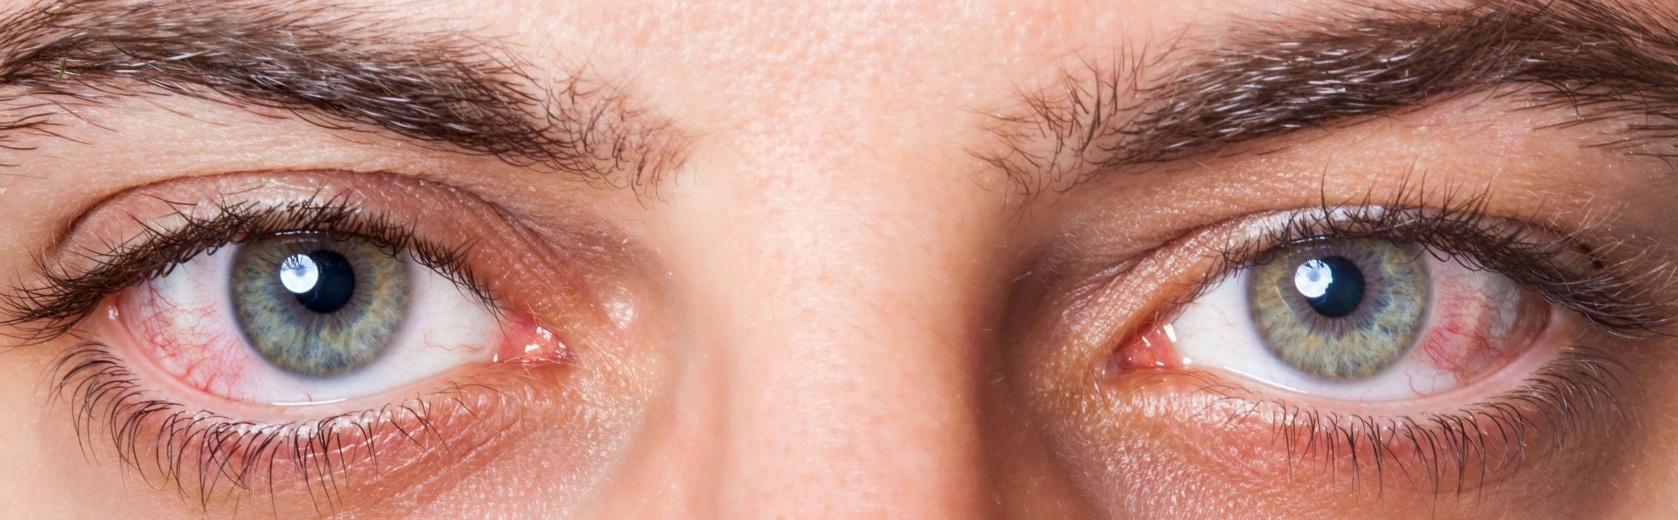 Options Optometrists dry eye treatments